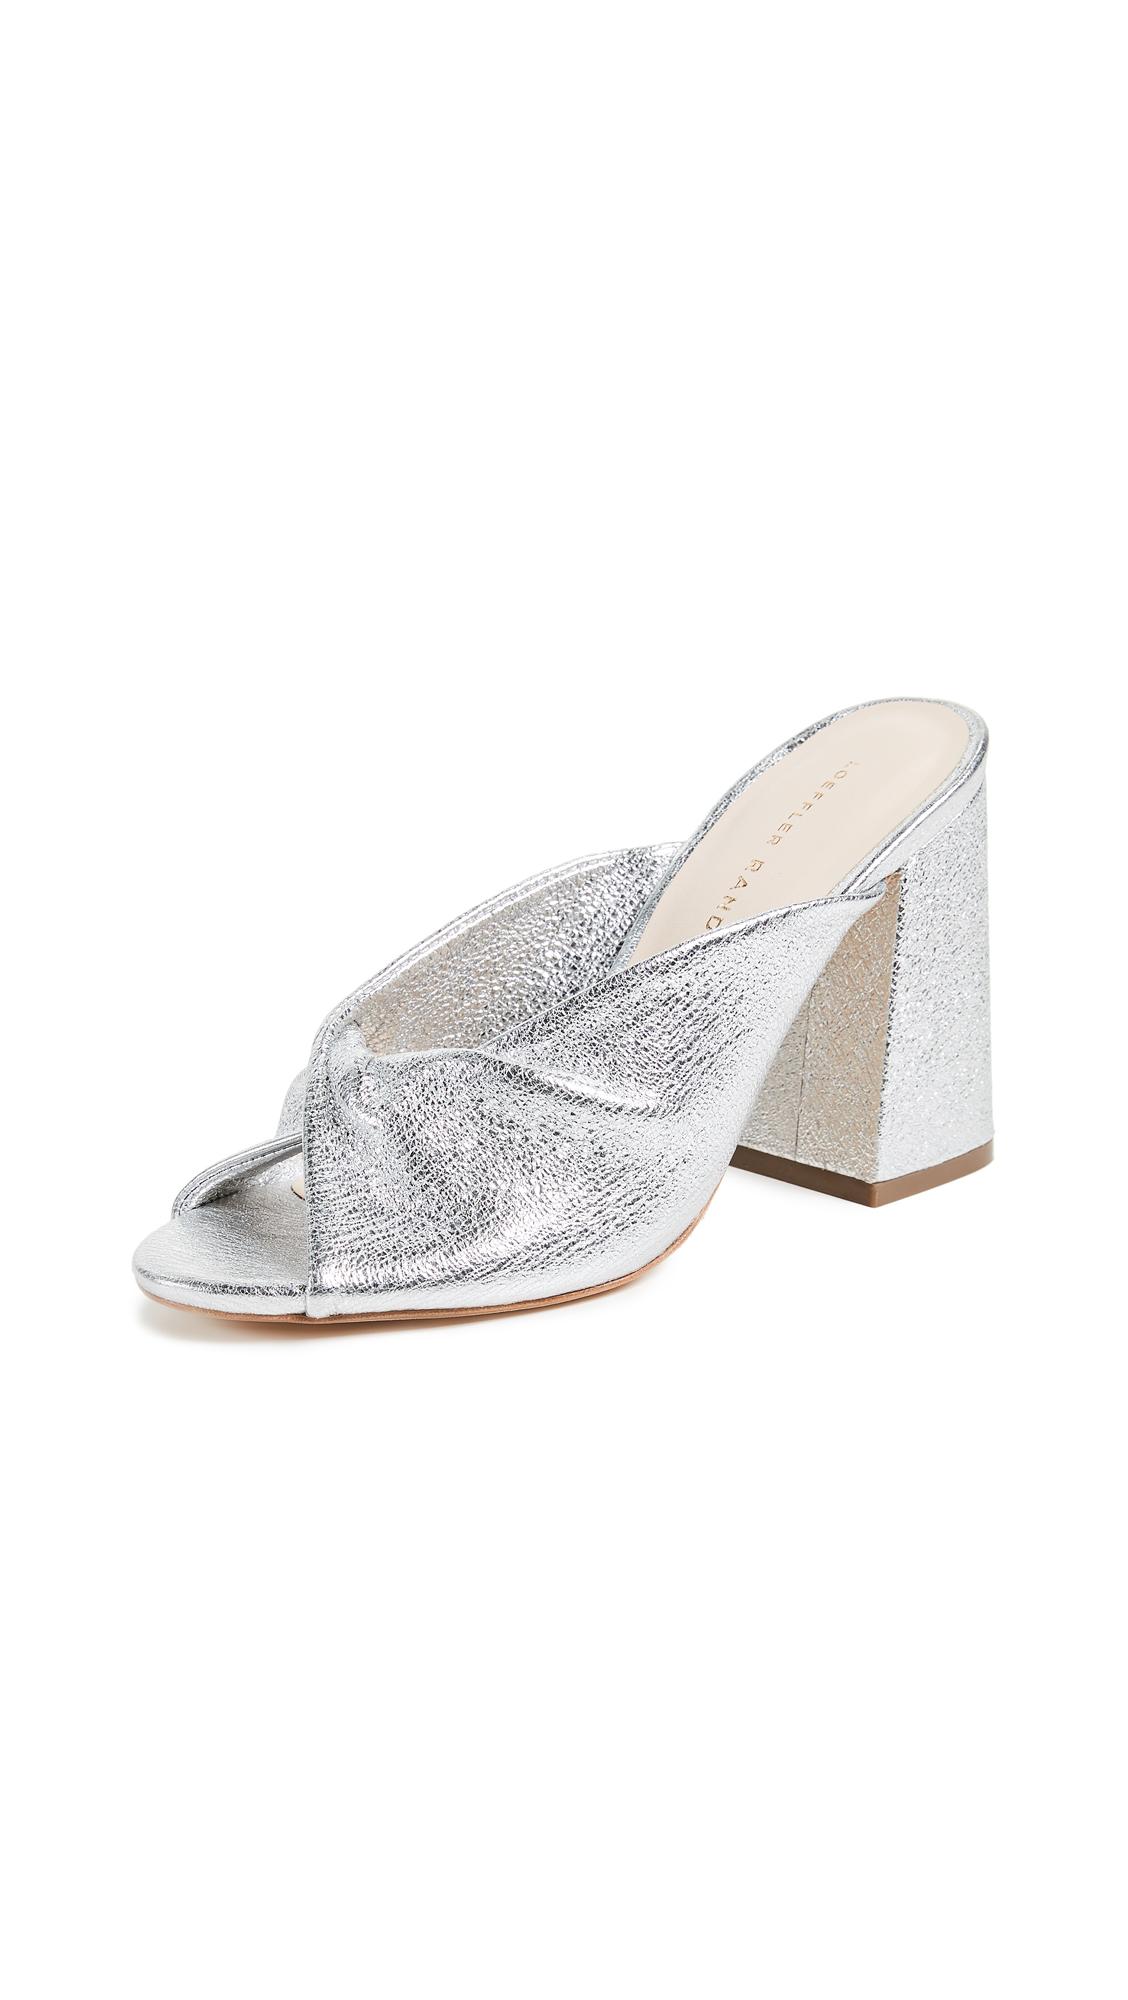 Loeffler Randall Laurel Open Toe Mules - Silver